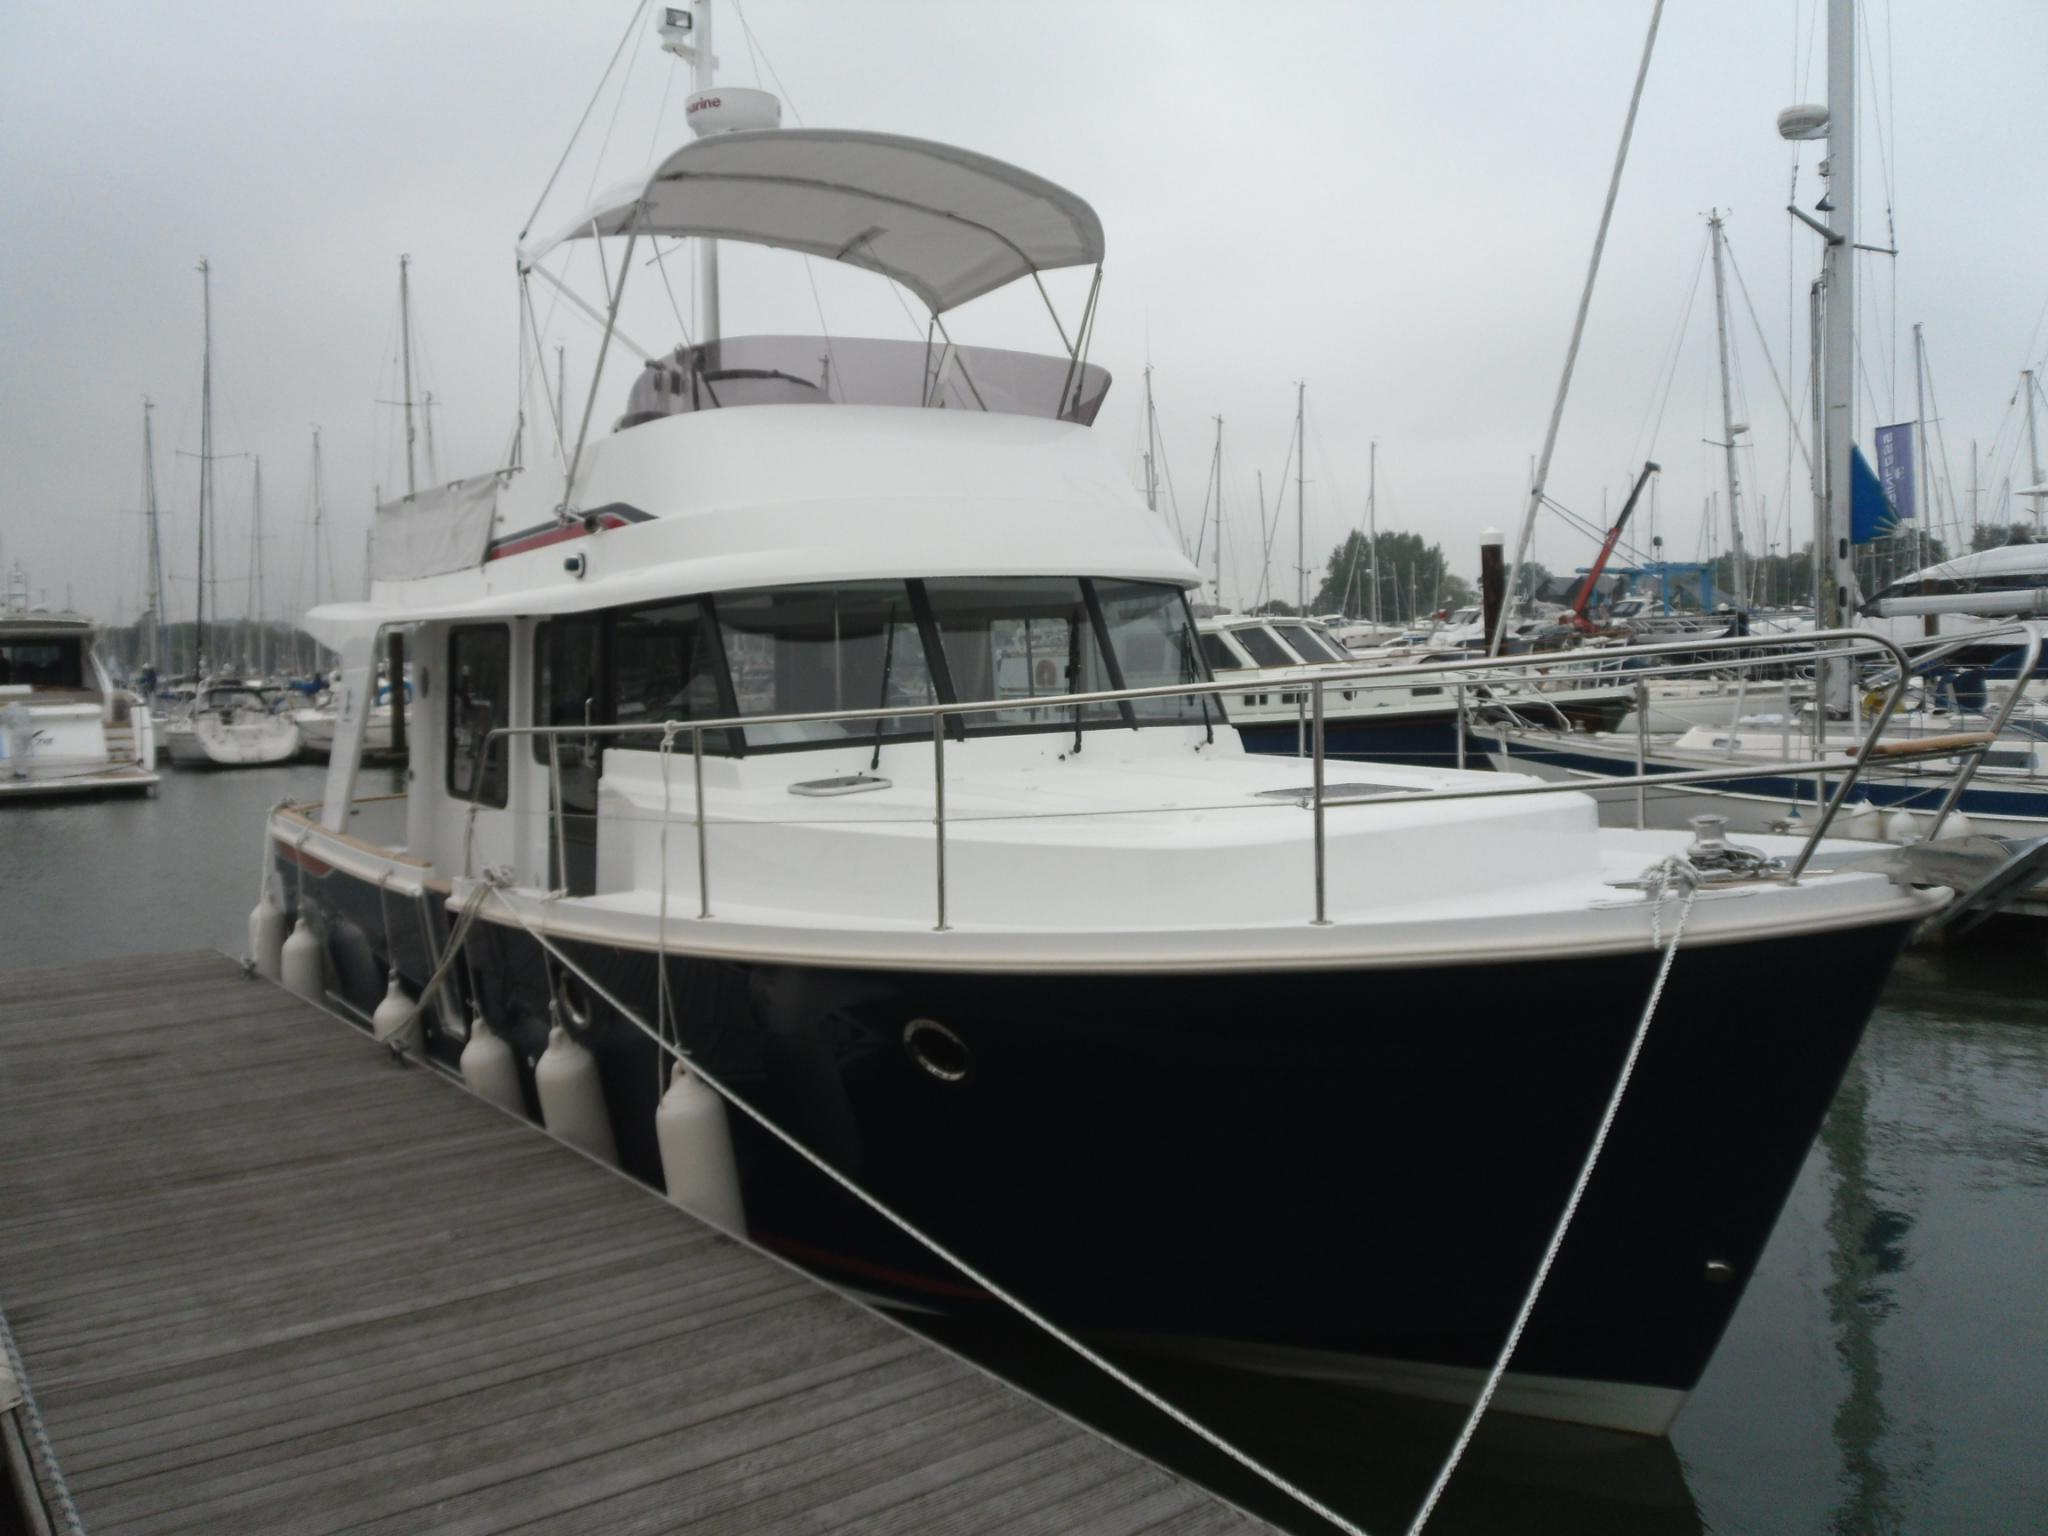 Beneteau Swift Trawler 34, Hampshire